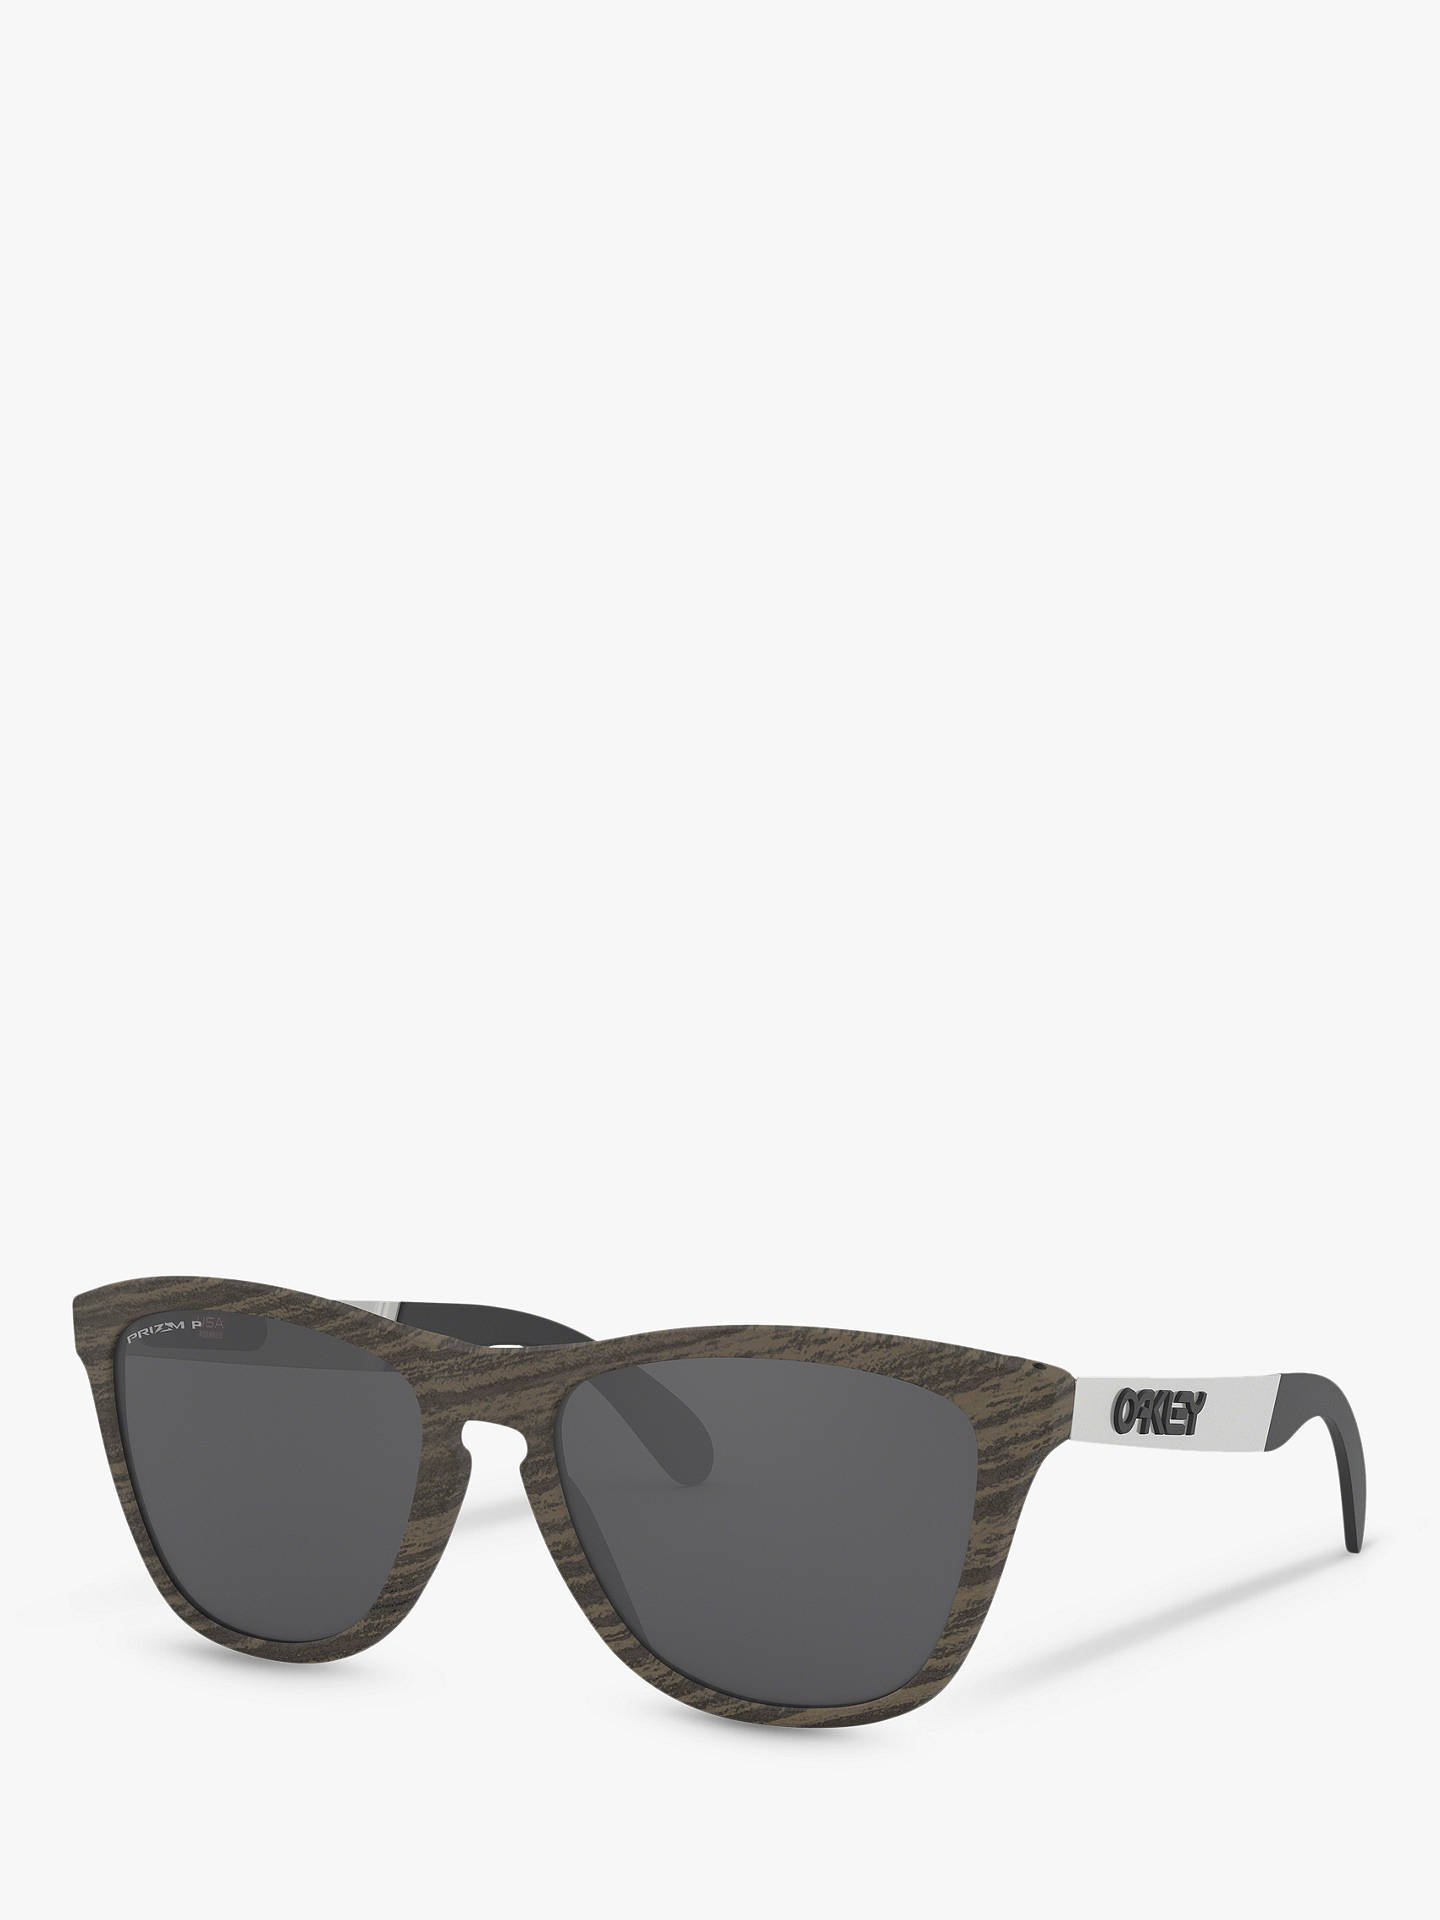 ce0542af5f7d Buy Oakley OO9428 Men's Frogskins Prizm Polarised Square Sunglasses,  Woodgrain Mix/Black Online at ...